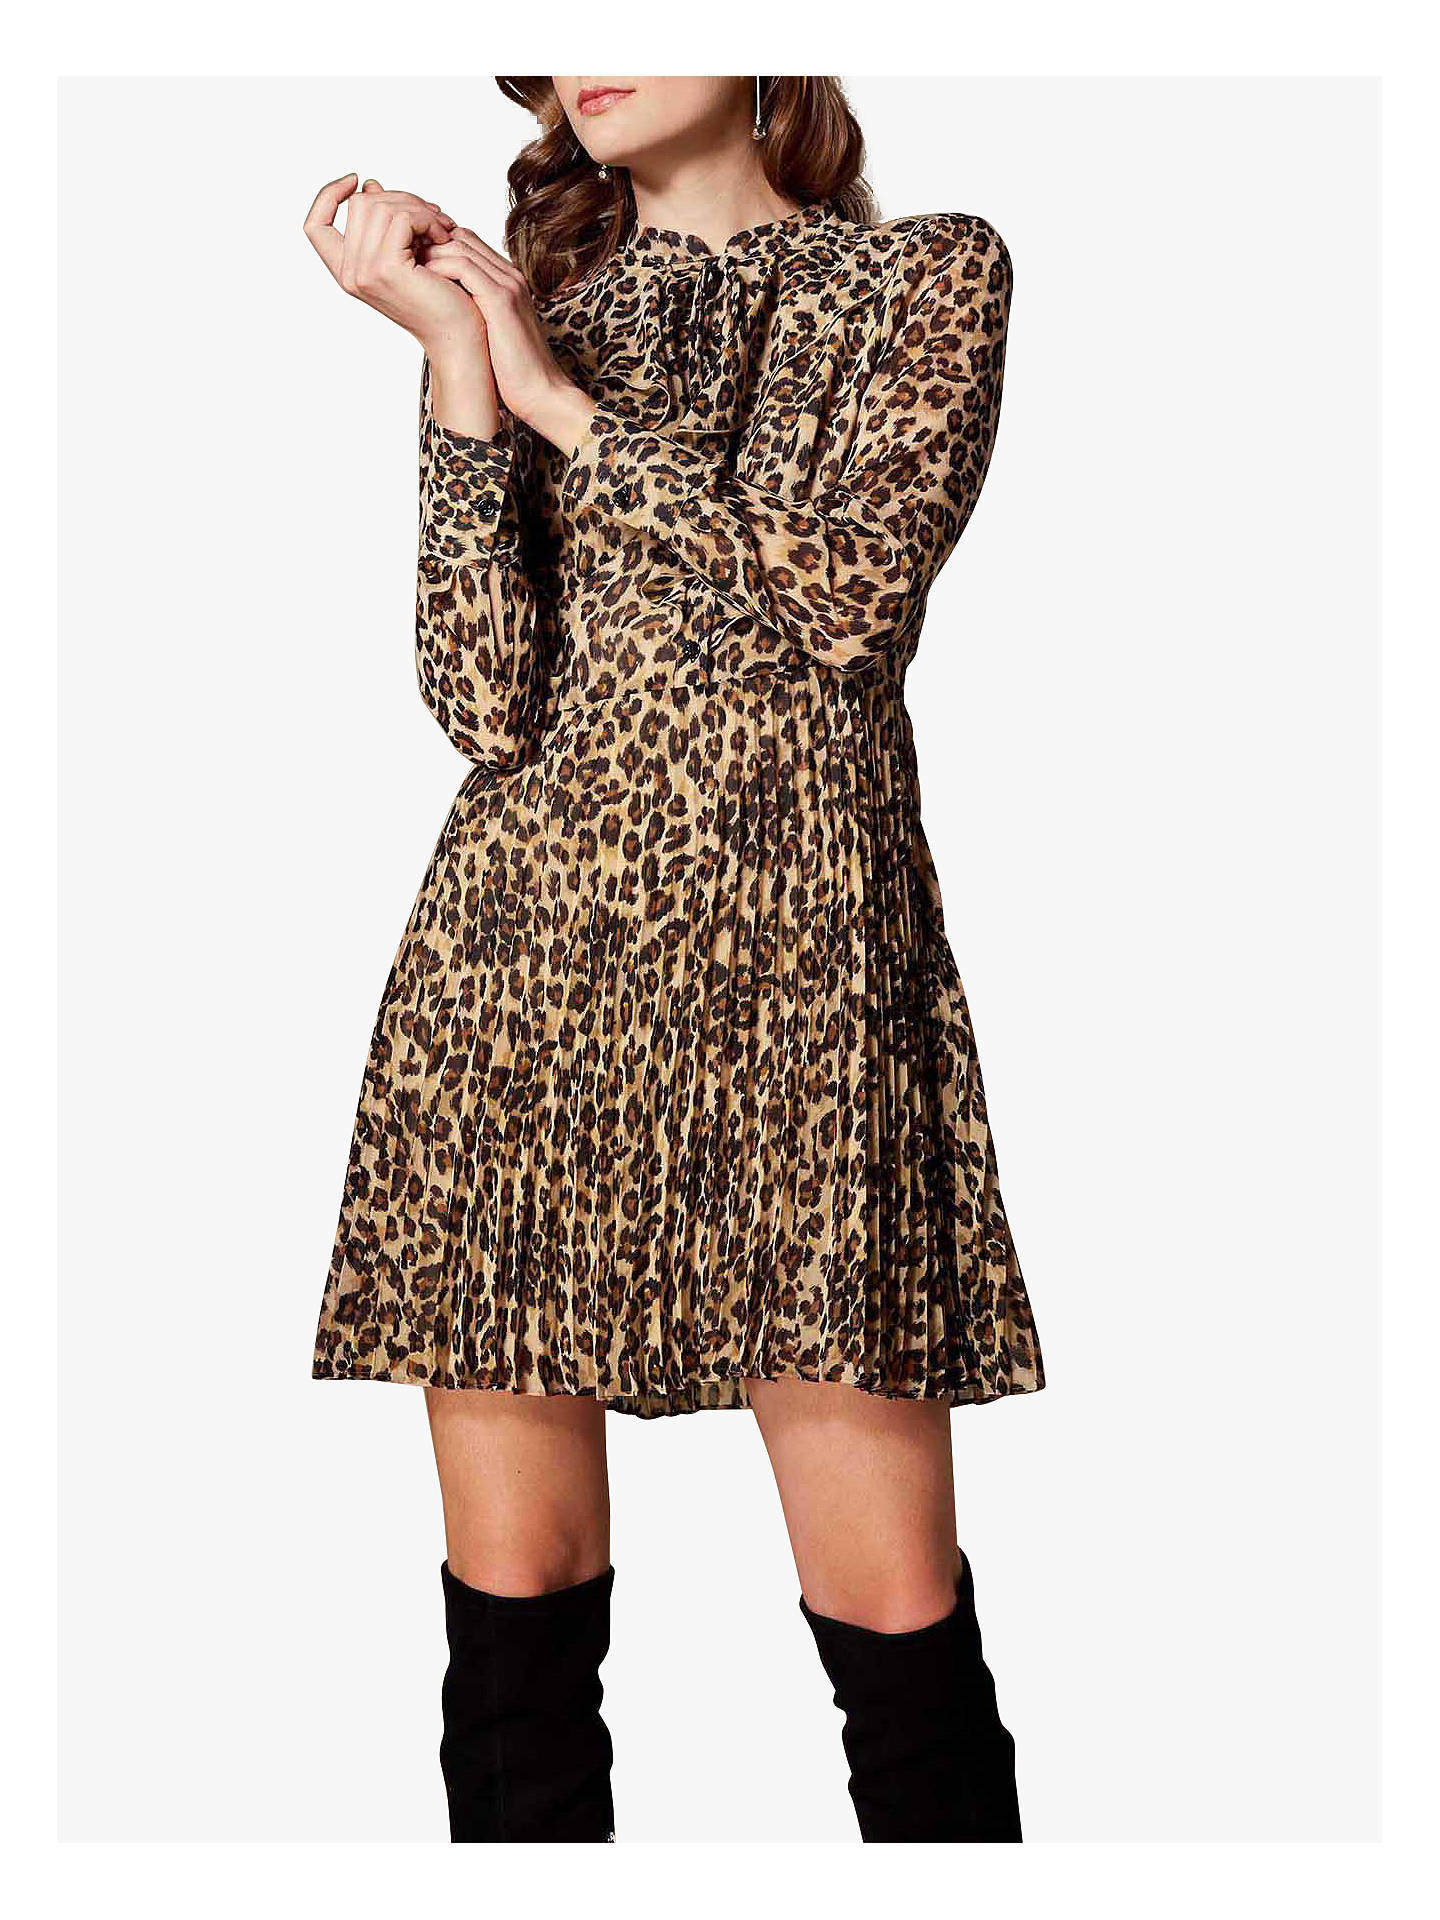 87c1013dc957 Buy Karen Millen Leopard Print Ruffle Dress, Multi, 6 Online at  johnlewis.com ...